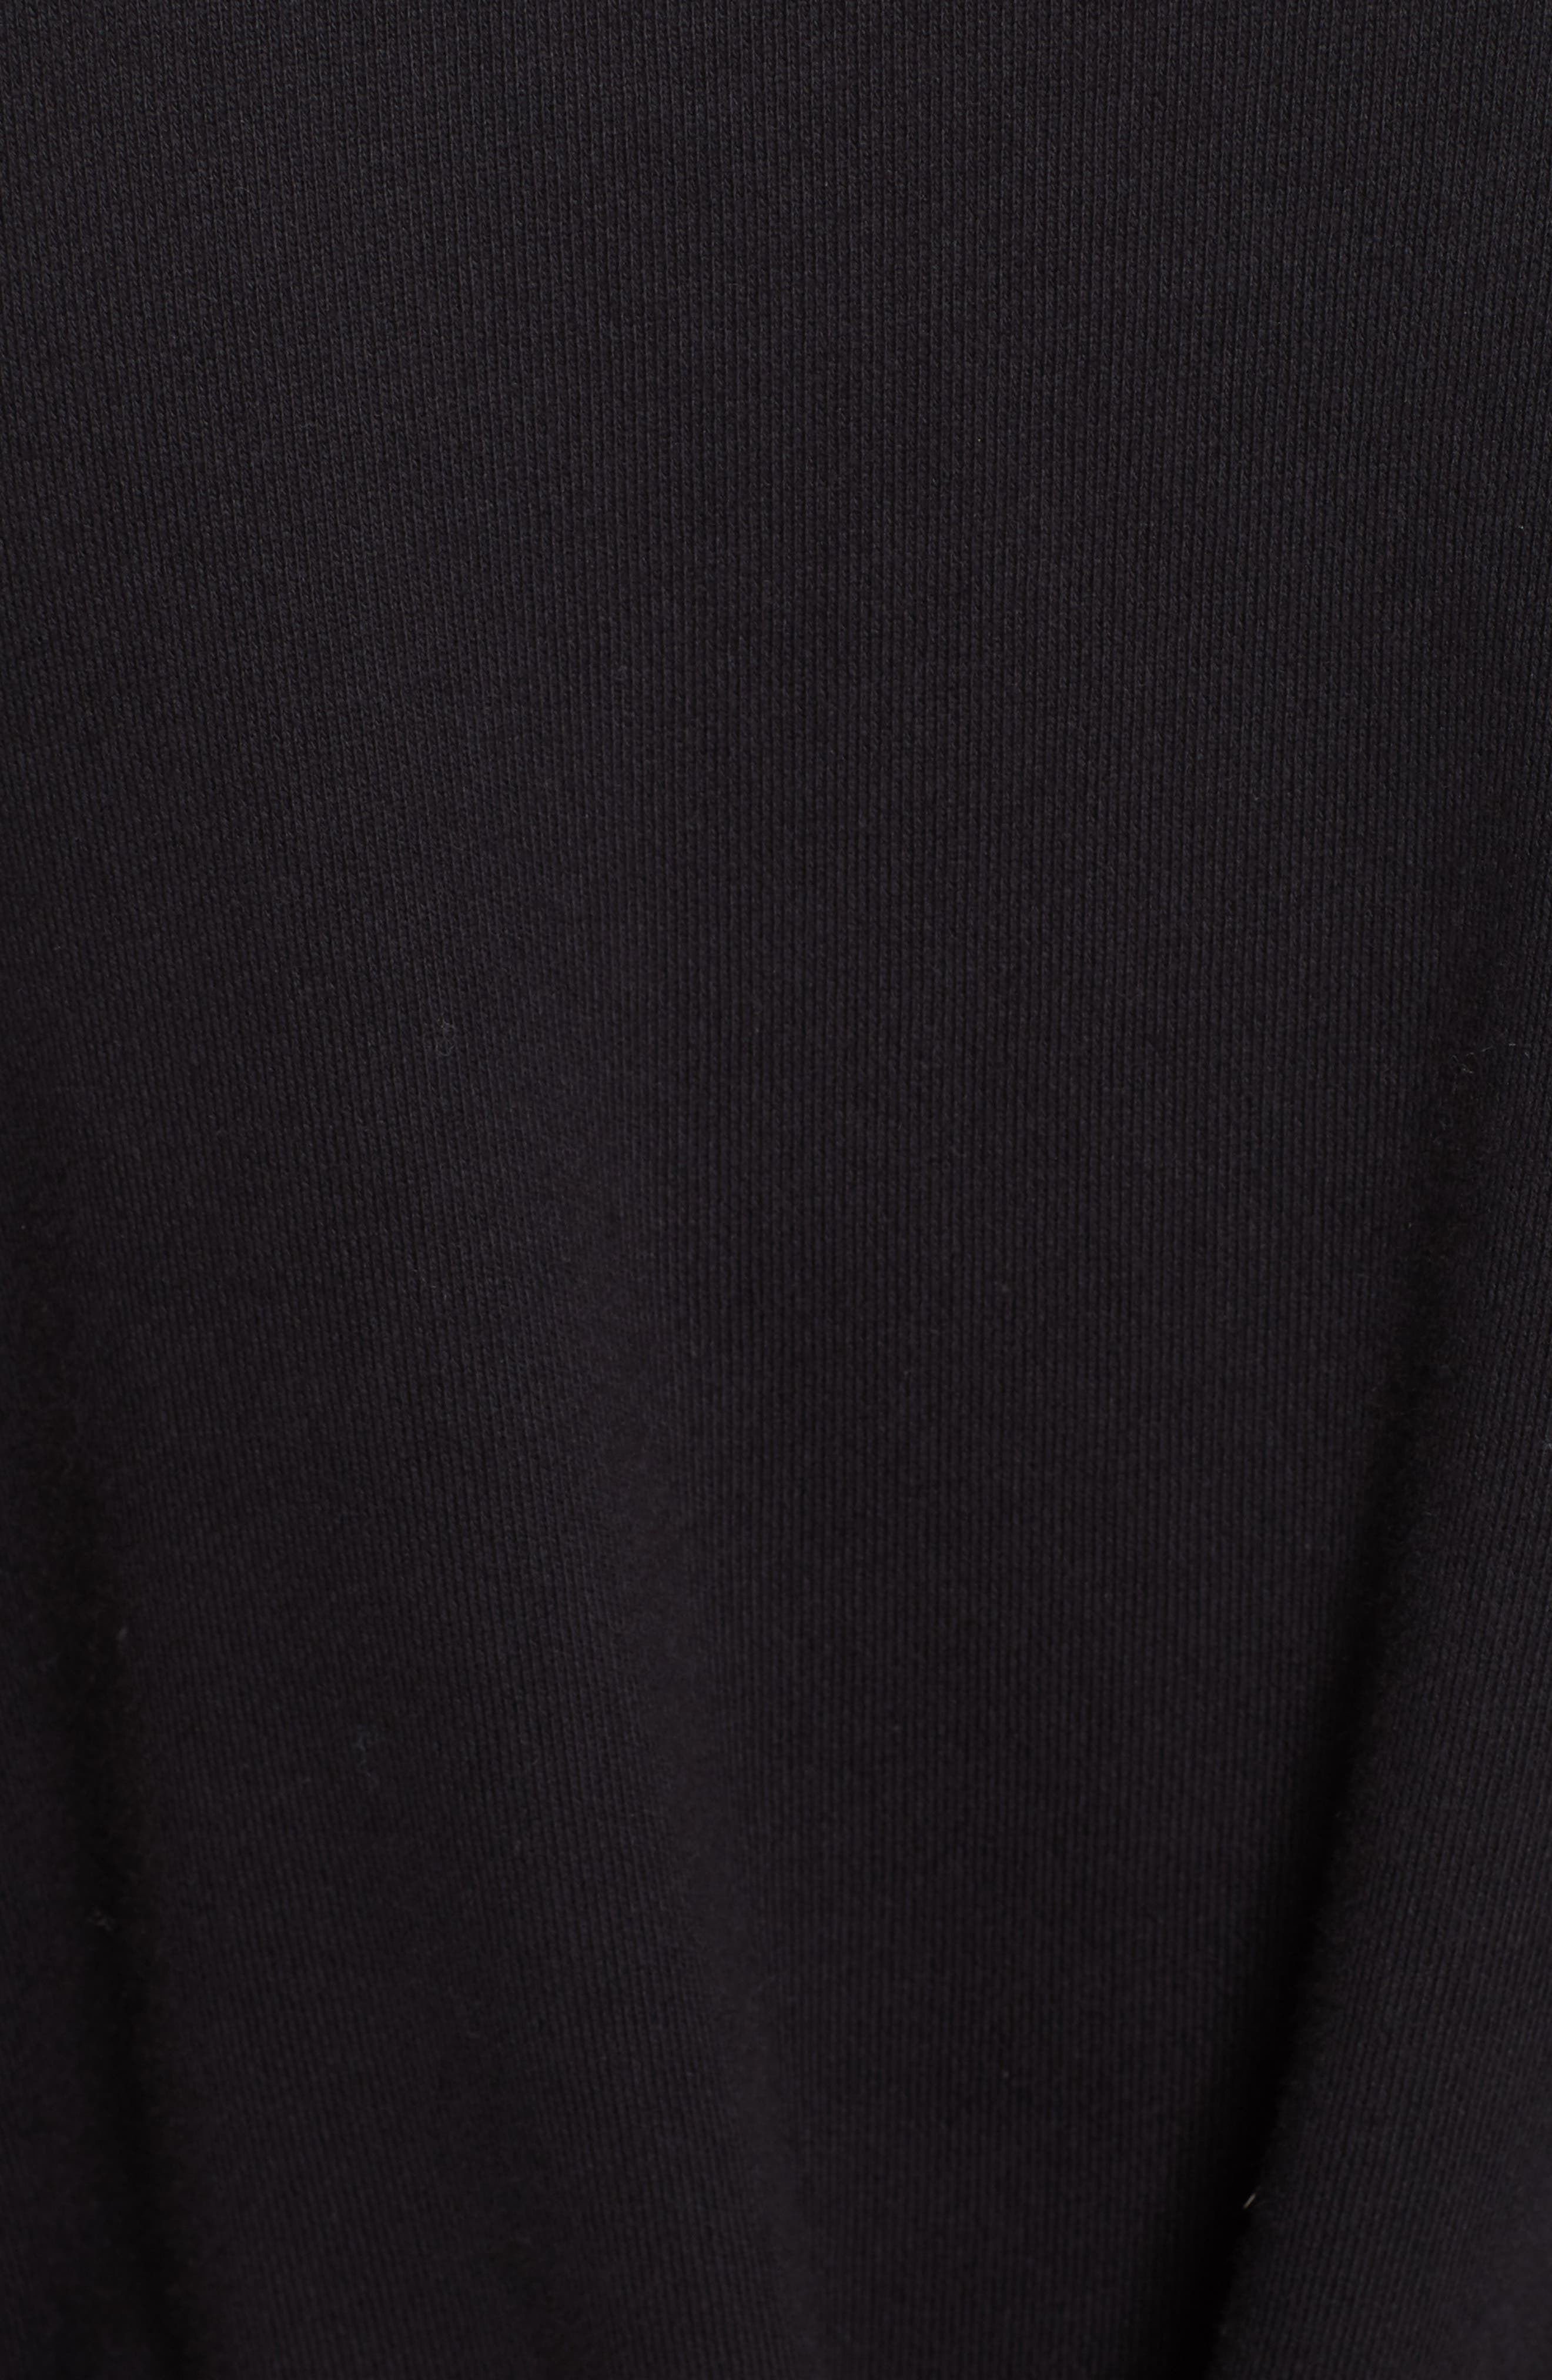 PSWL Belted Sweatshirt Dress,                             Alternate thumbnail 6, color,                             BLACK